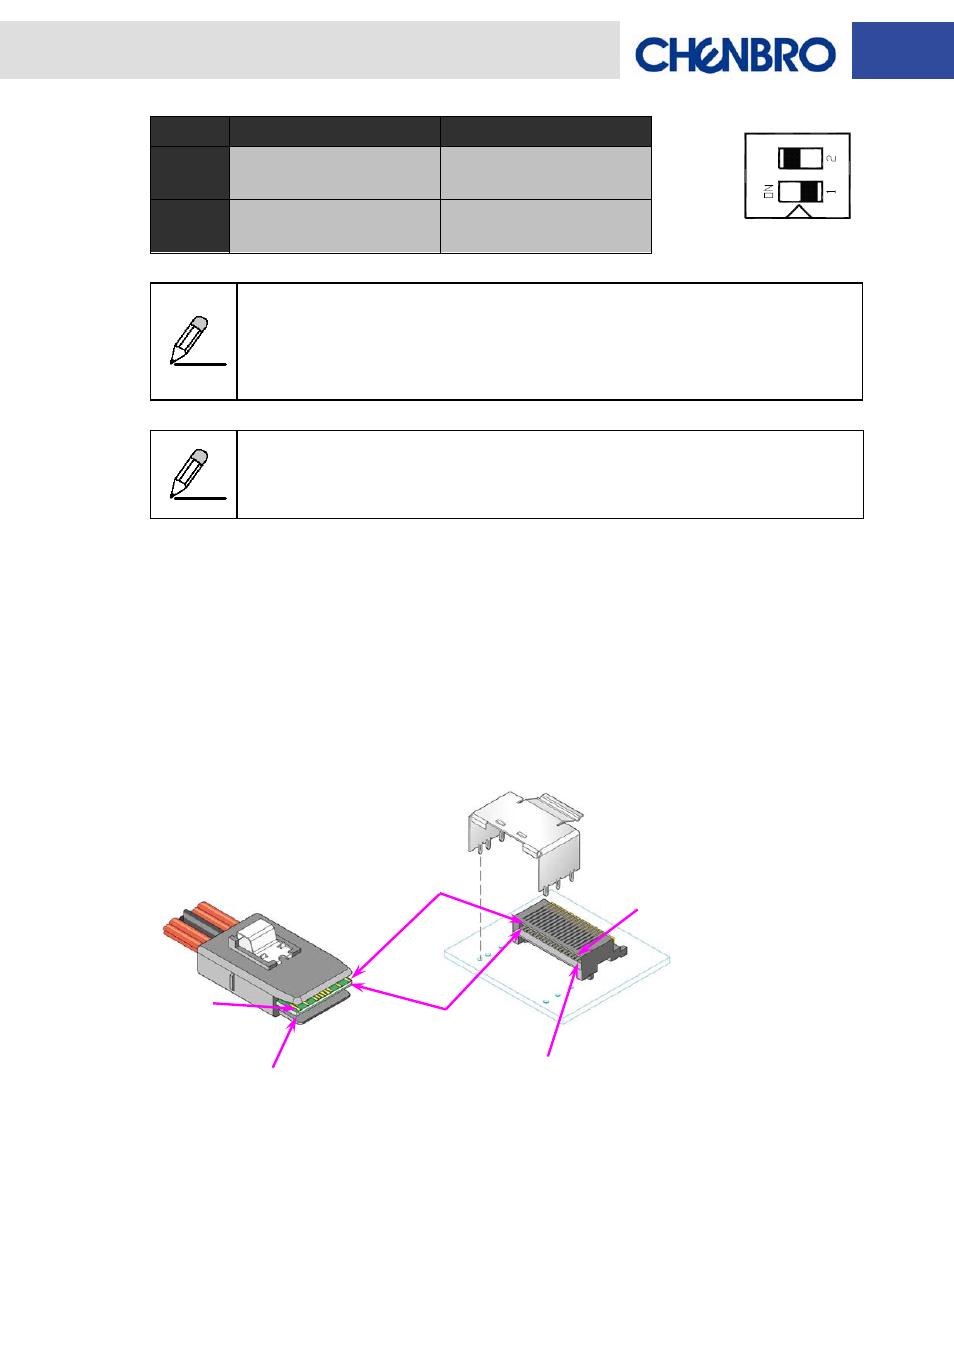 chenbro rm31616 6gb  s 16 port 3 5 mini sas backplane 80h10331604a0  manual user manual page samsung user manuals un40eh5300 samsung user manuals pdf